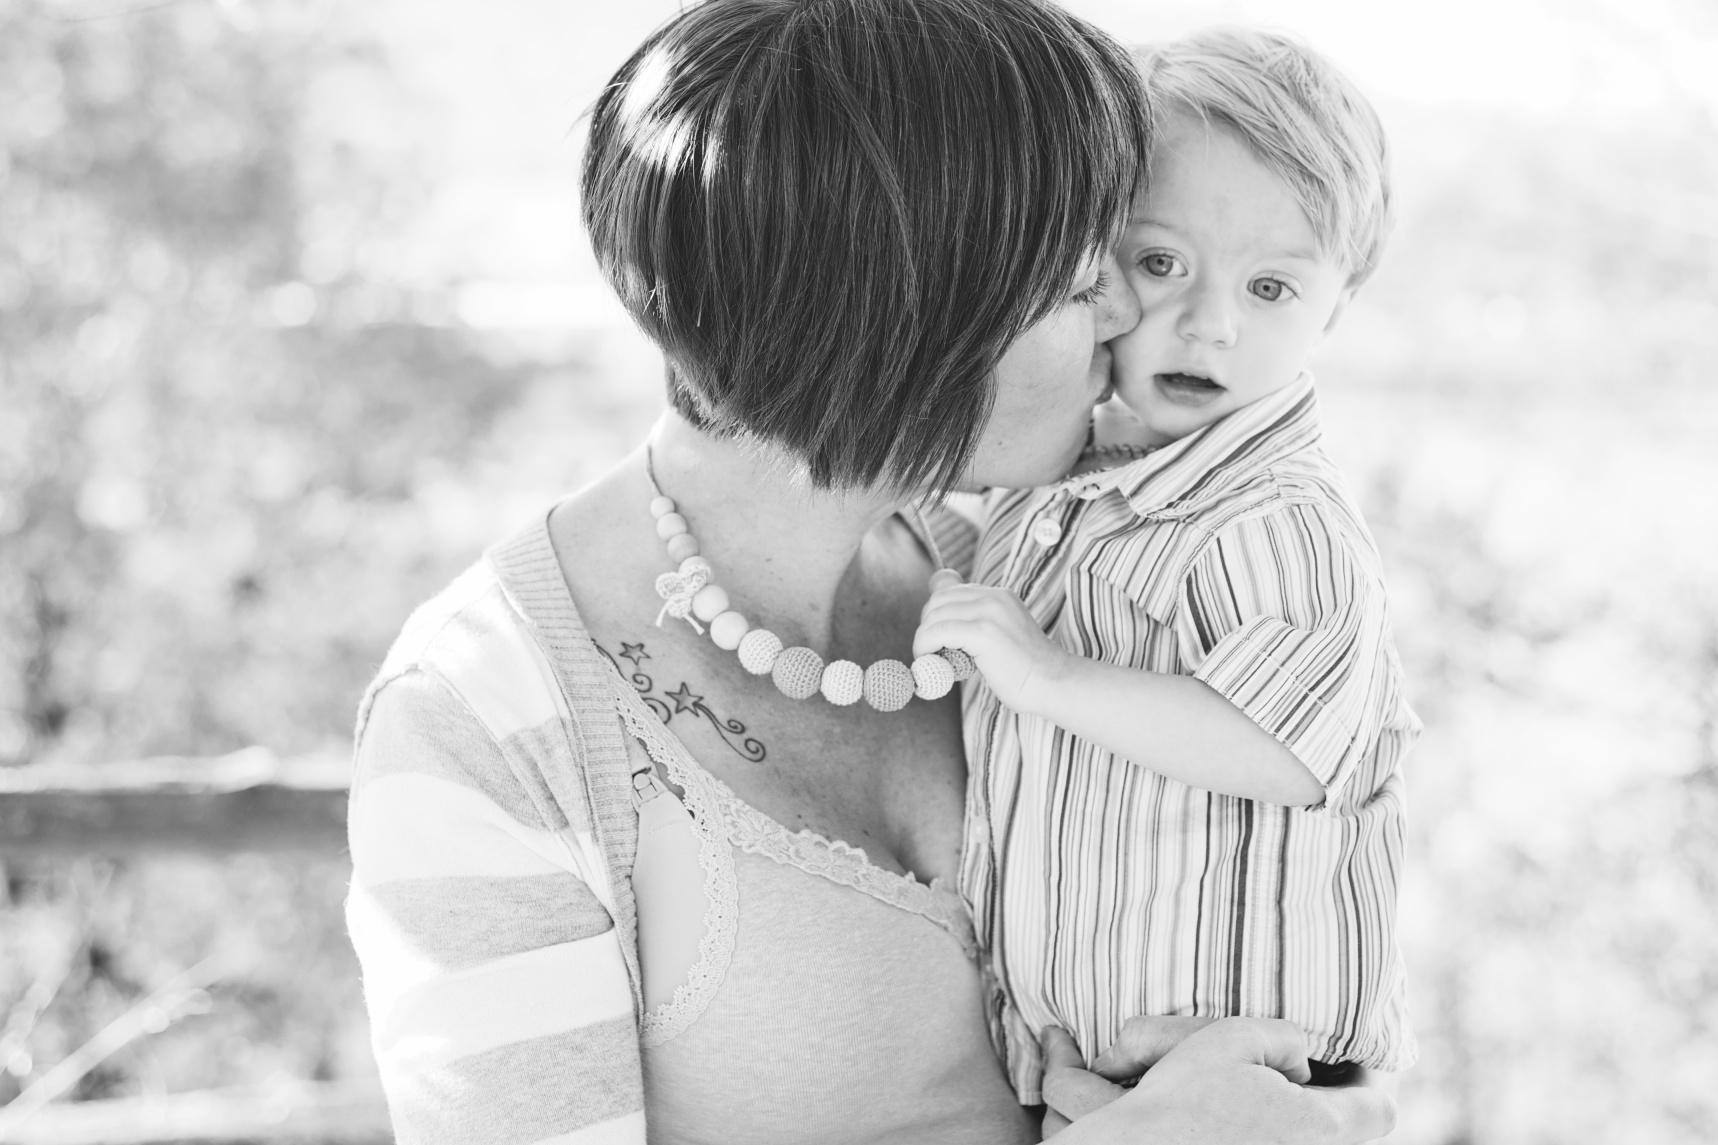 laurenlphotography(motherhood) 2 (2).jpg